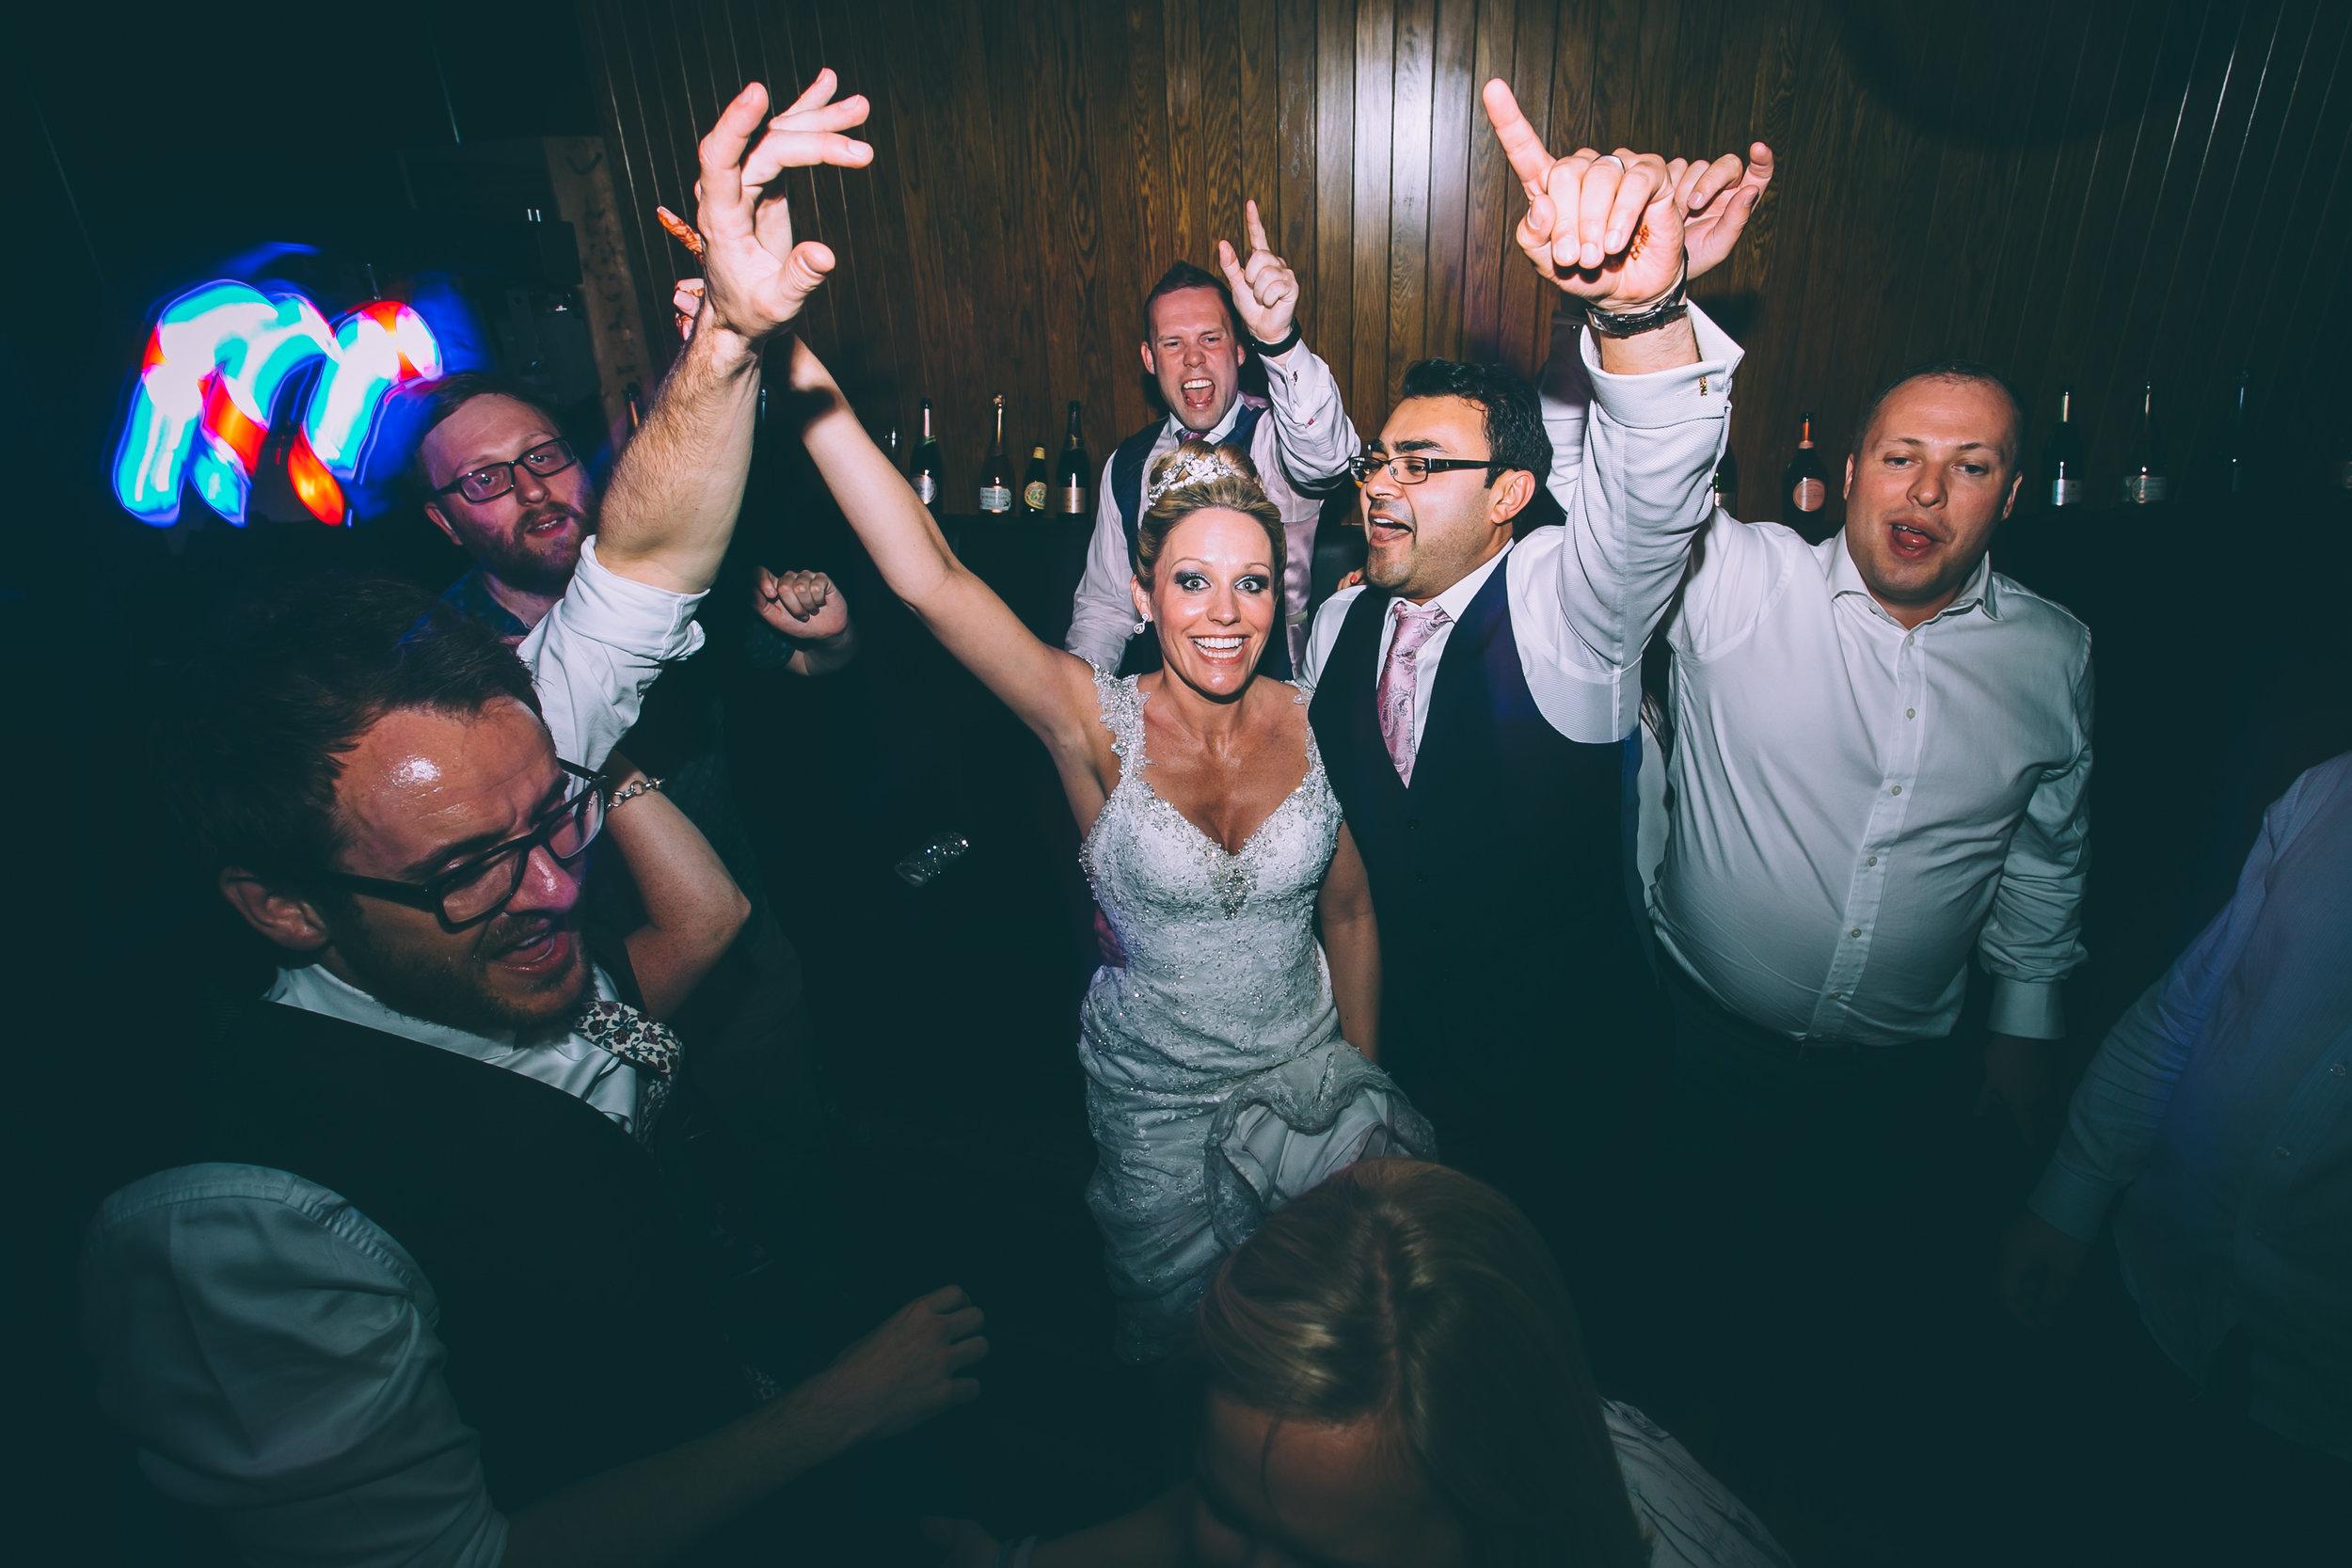 Nish&Emma-DAYTHREE-Wedding-in-manchester-town-hall-tom-biddle-photography-tb568.jpg